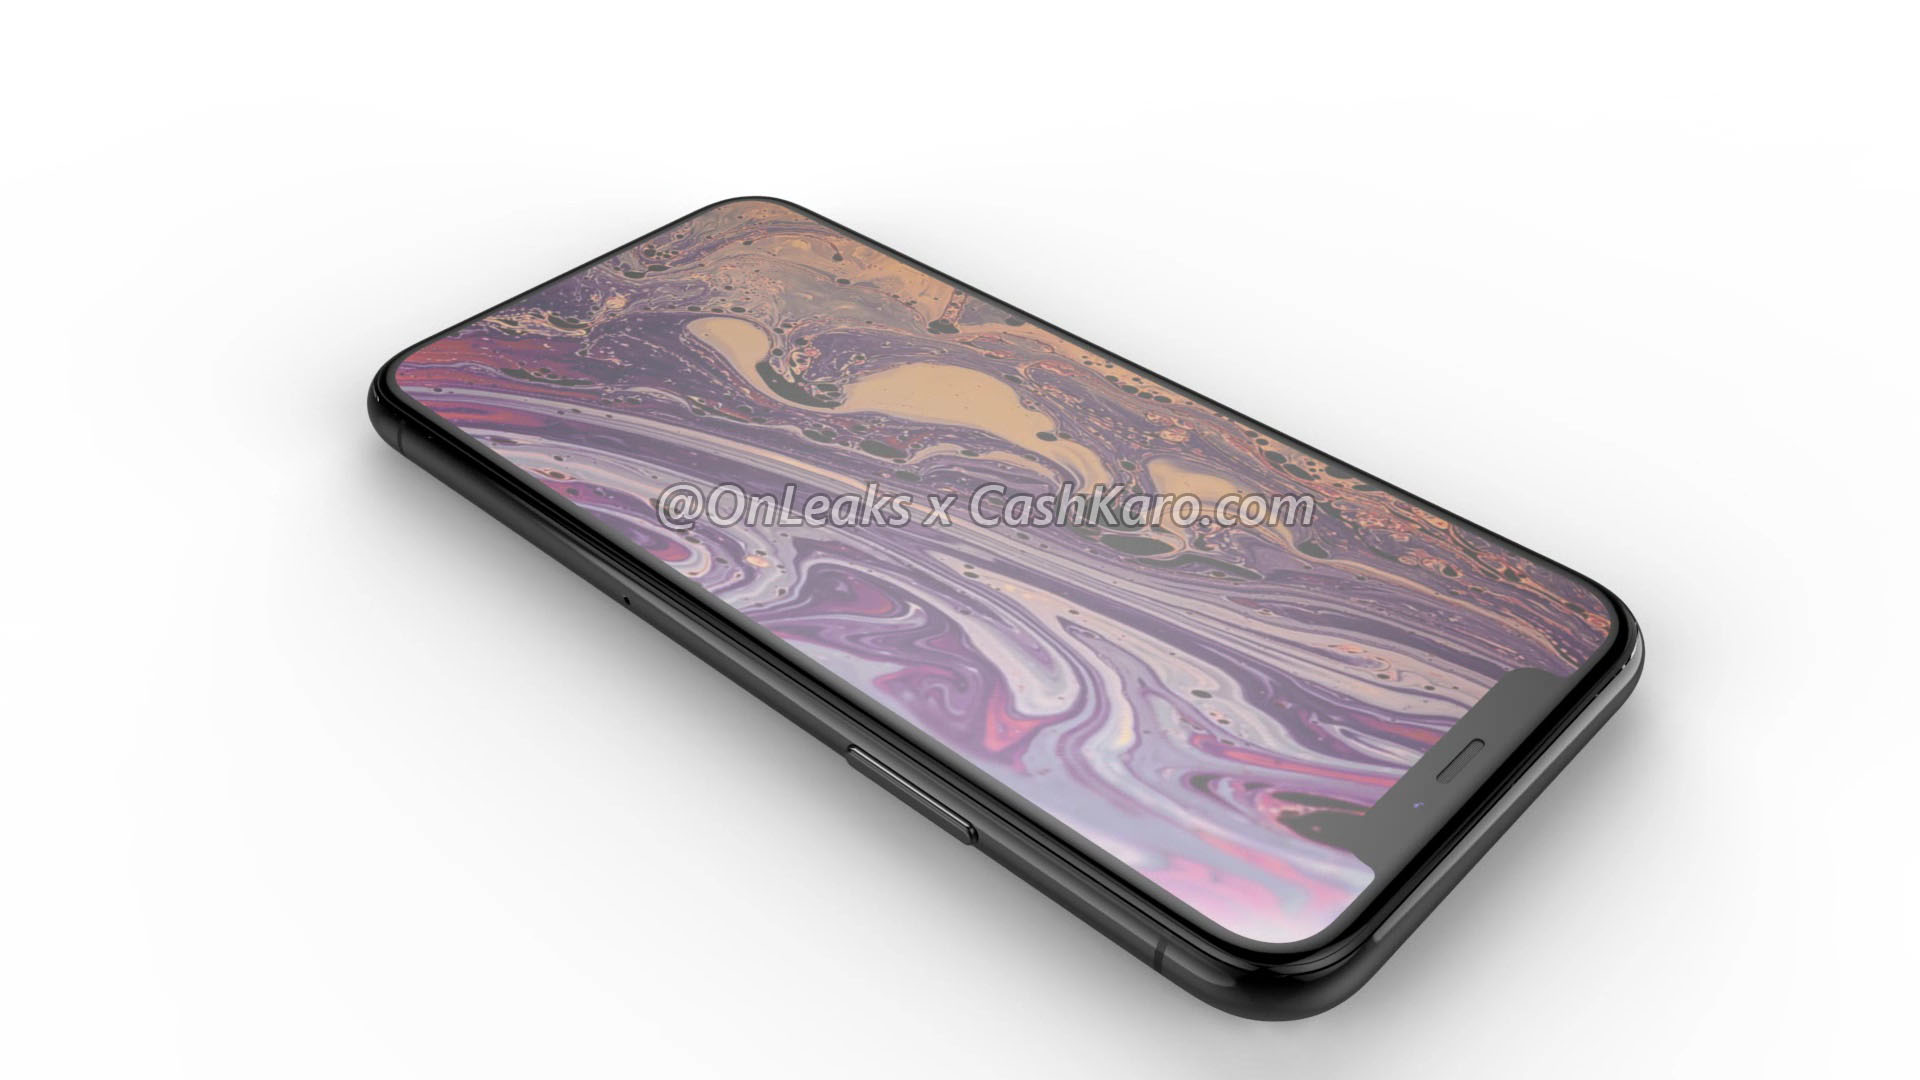 iPhone-XI-04 Cashkaro